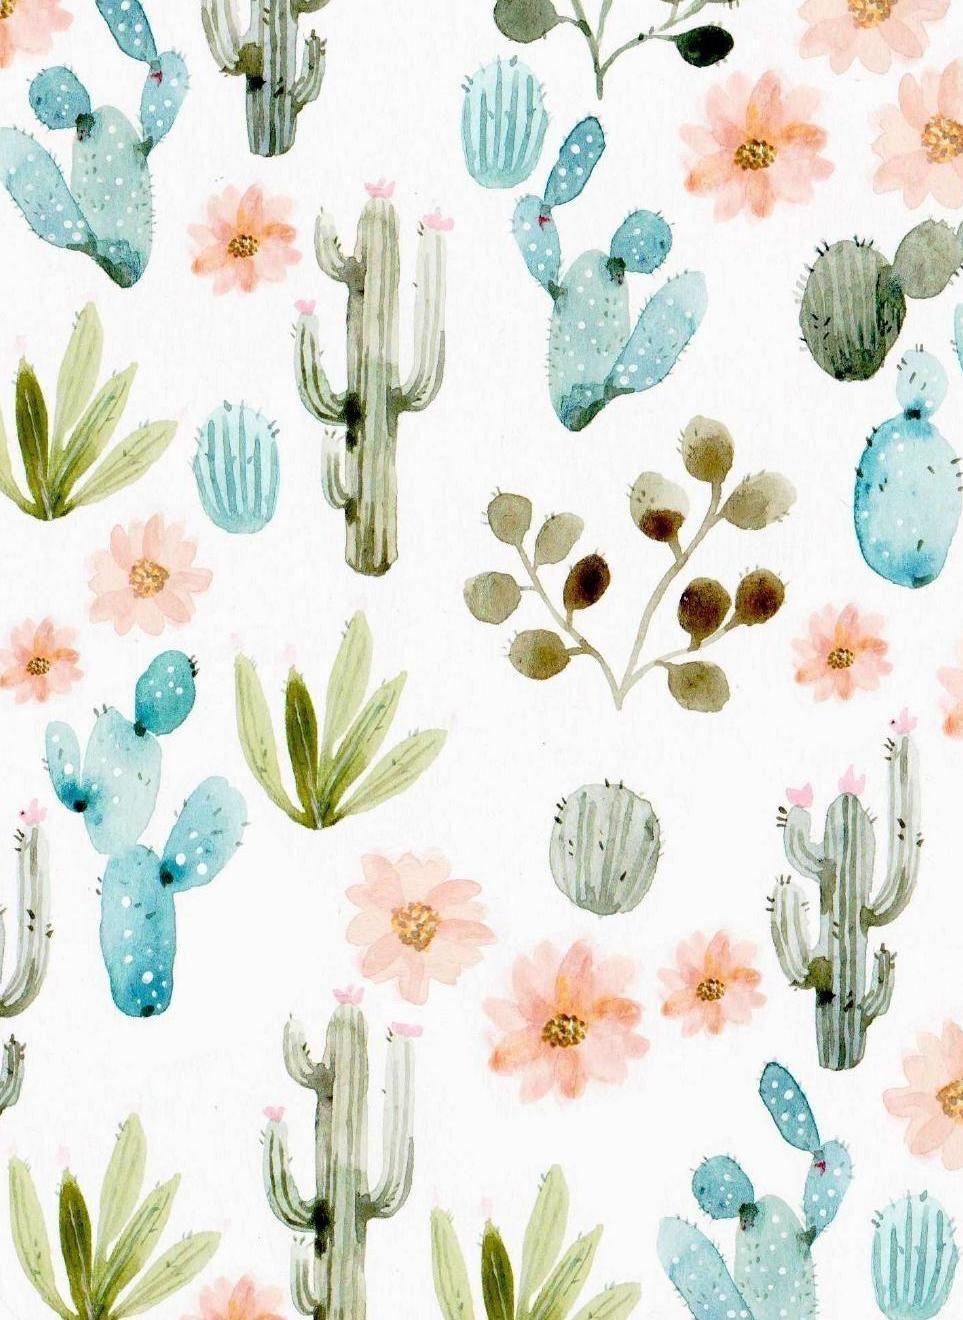 Iphone wallpaper tumblr floral -  Floral Pastel Tumblr Wallpaper Iphone Download